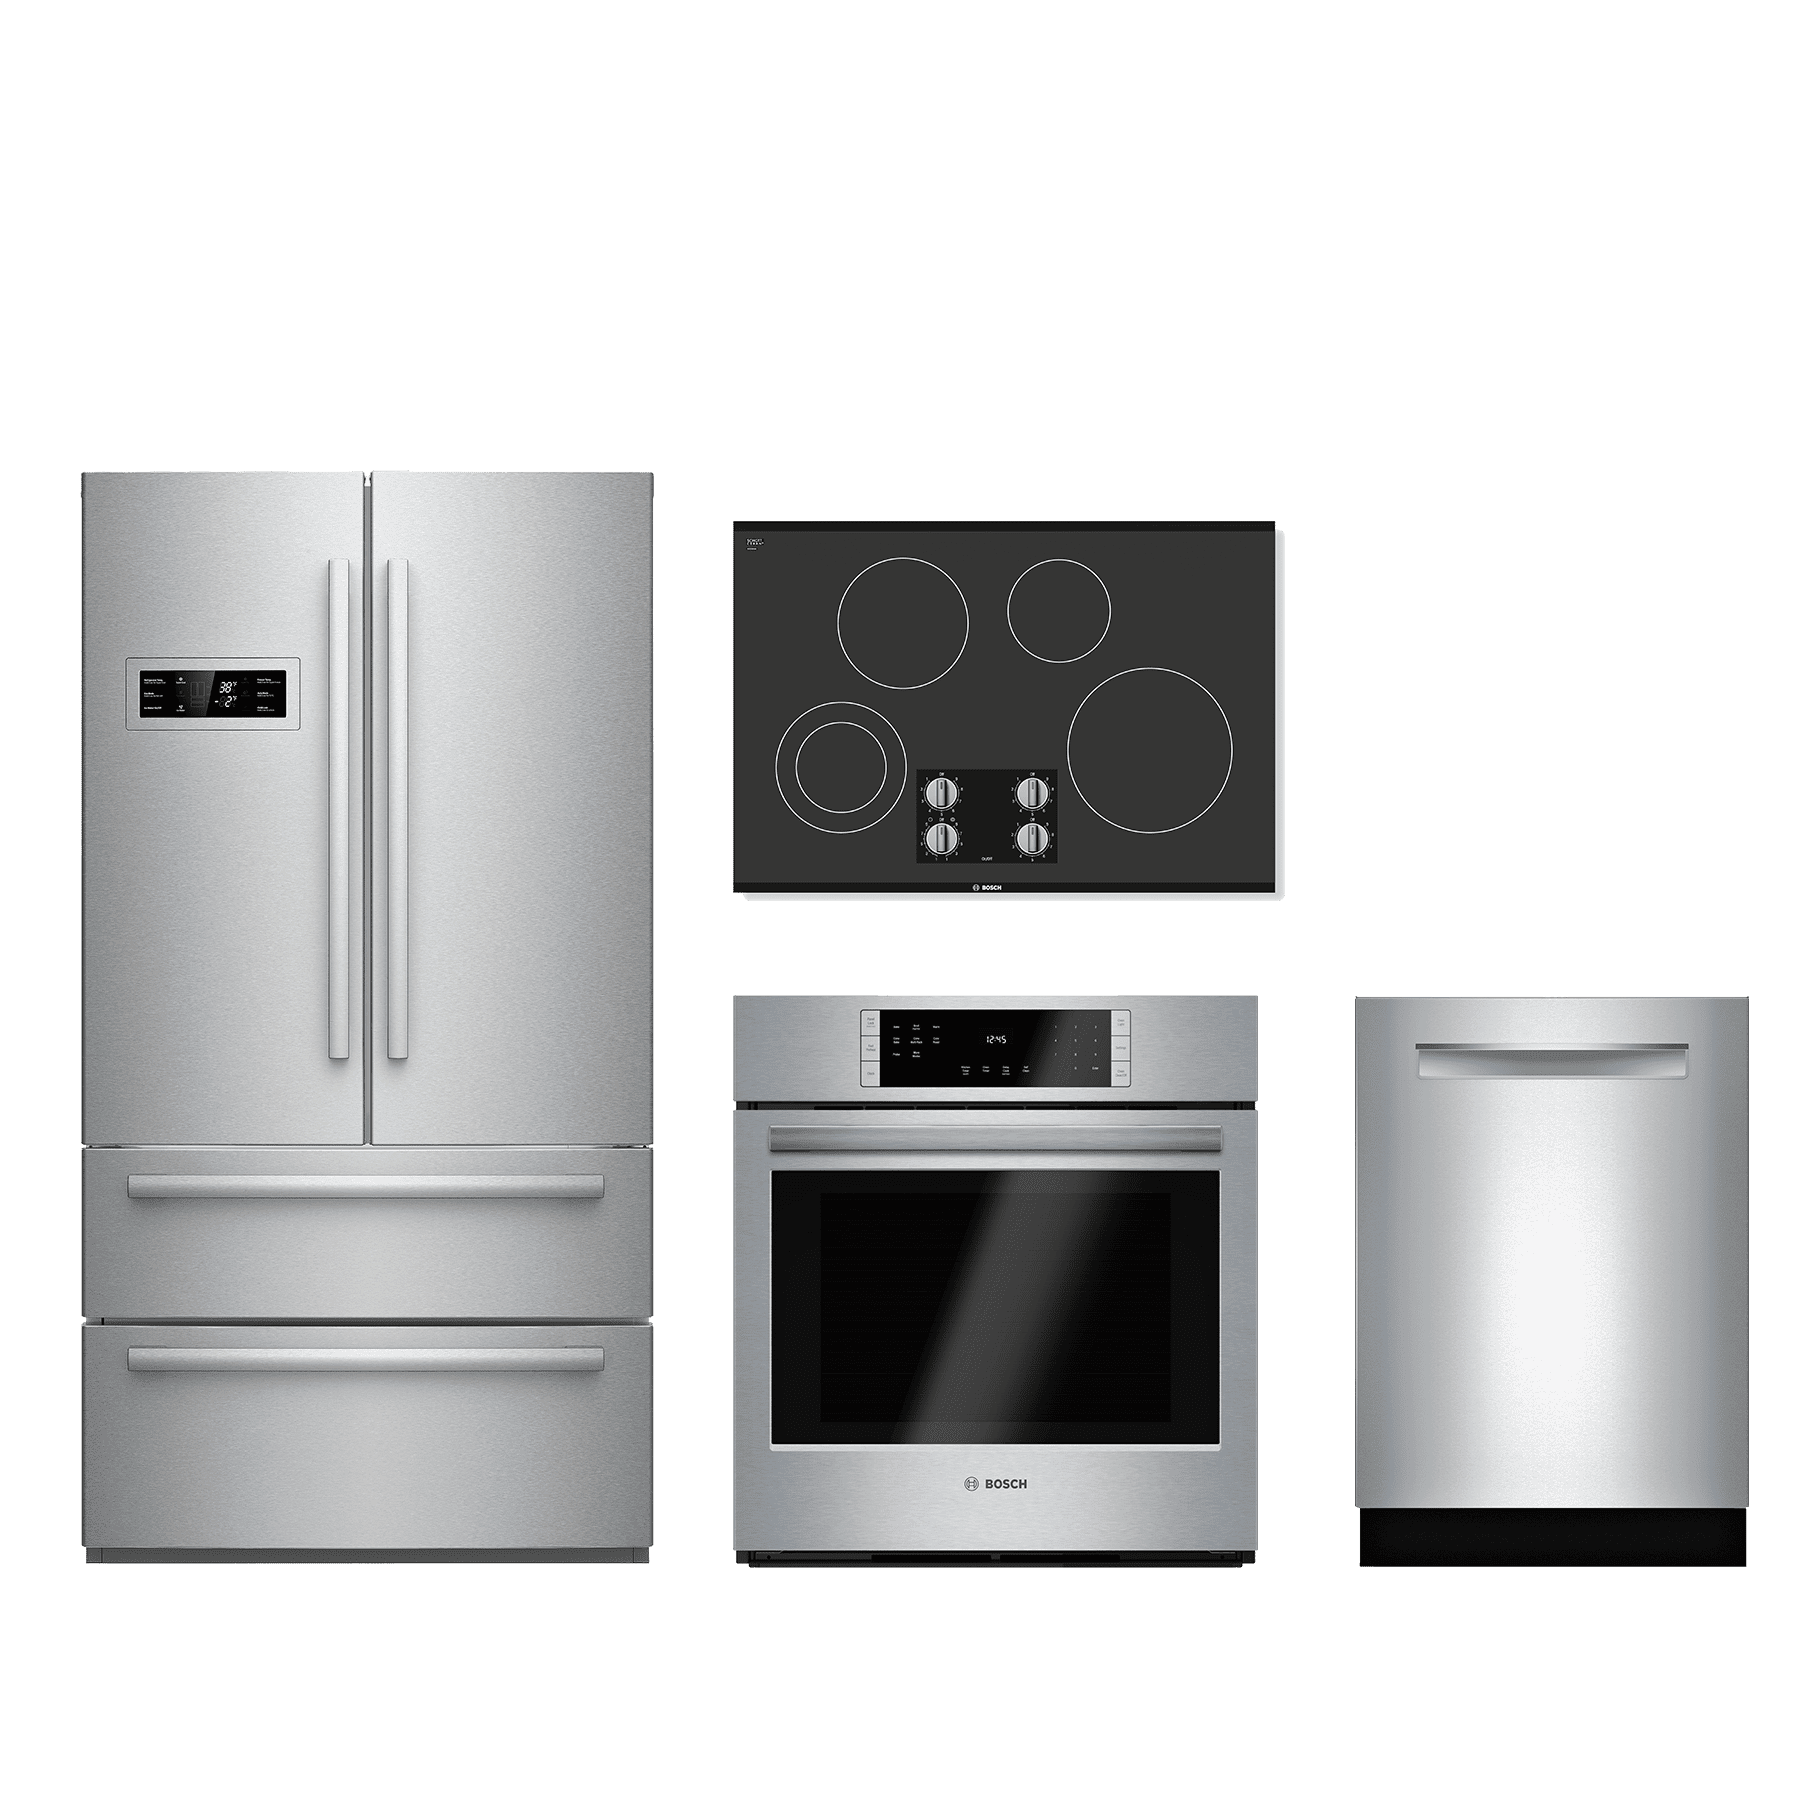 Kitchen Appliance Packages Home Appliances, Kitchen Appliances in ...